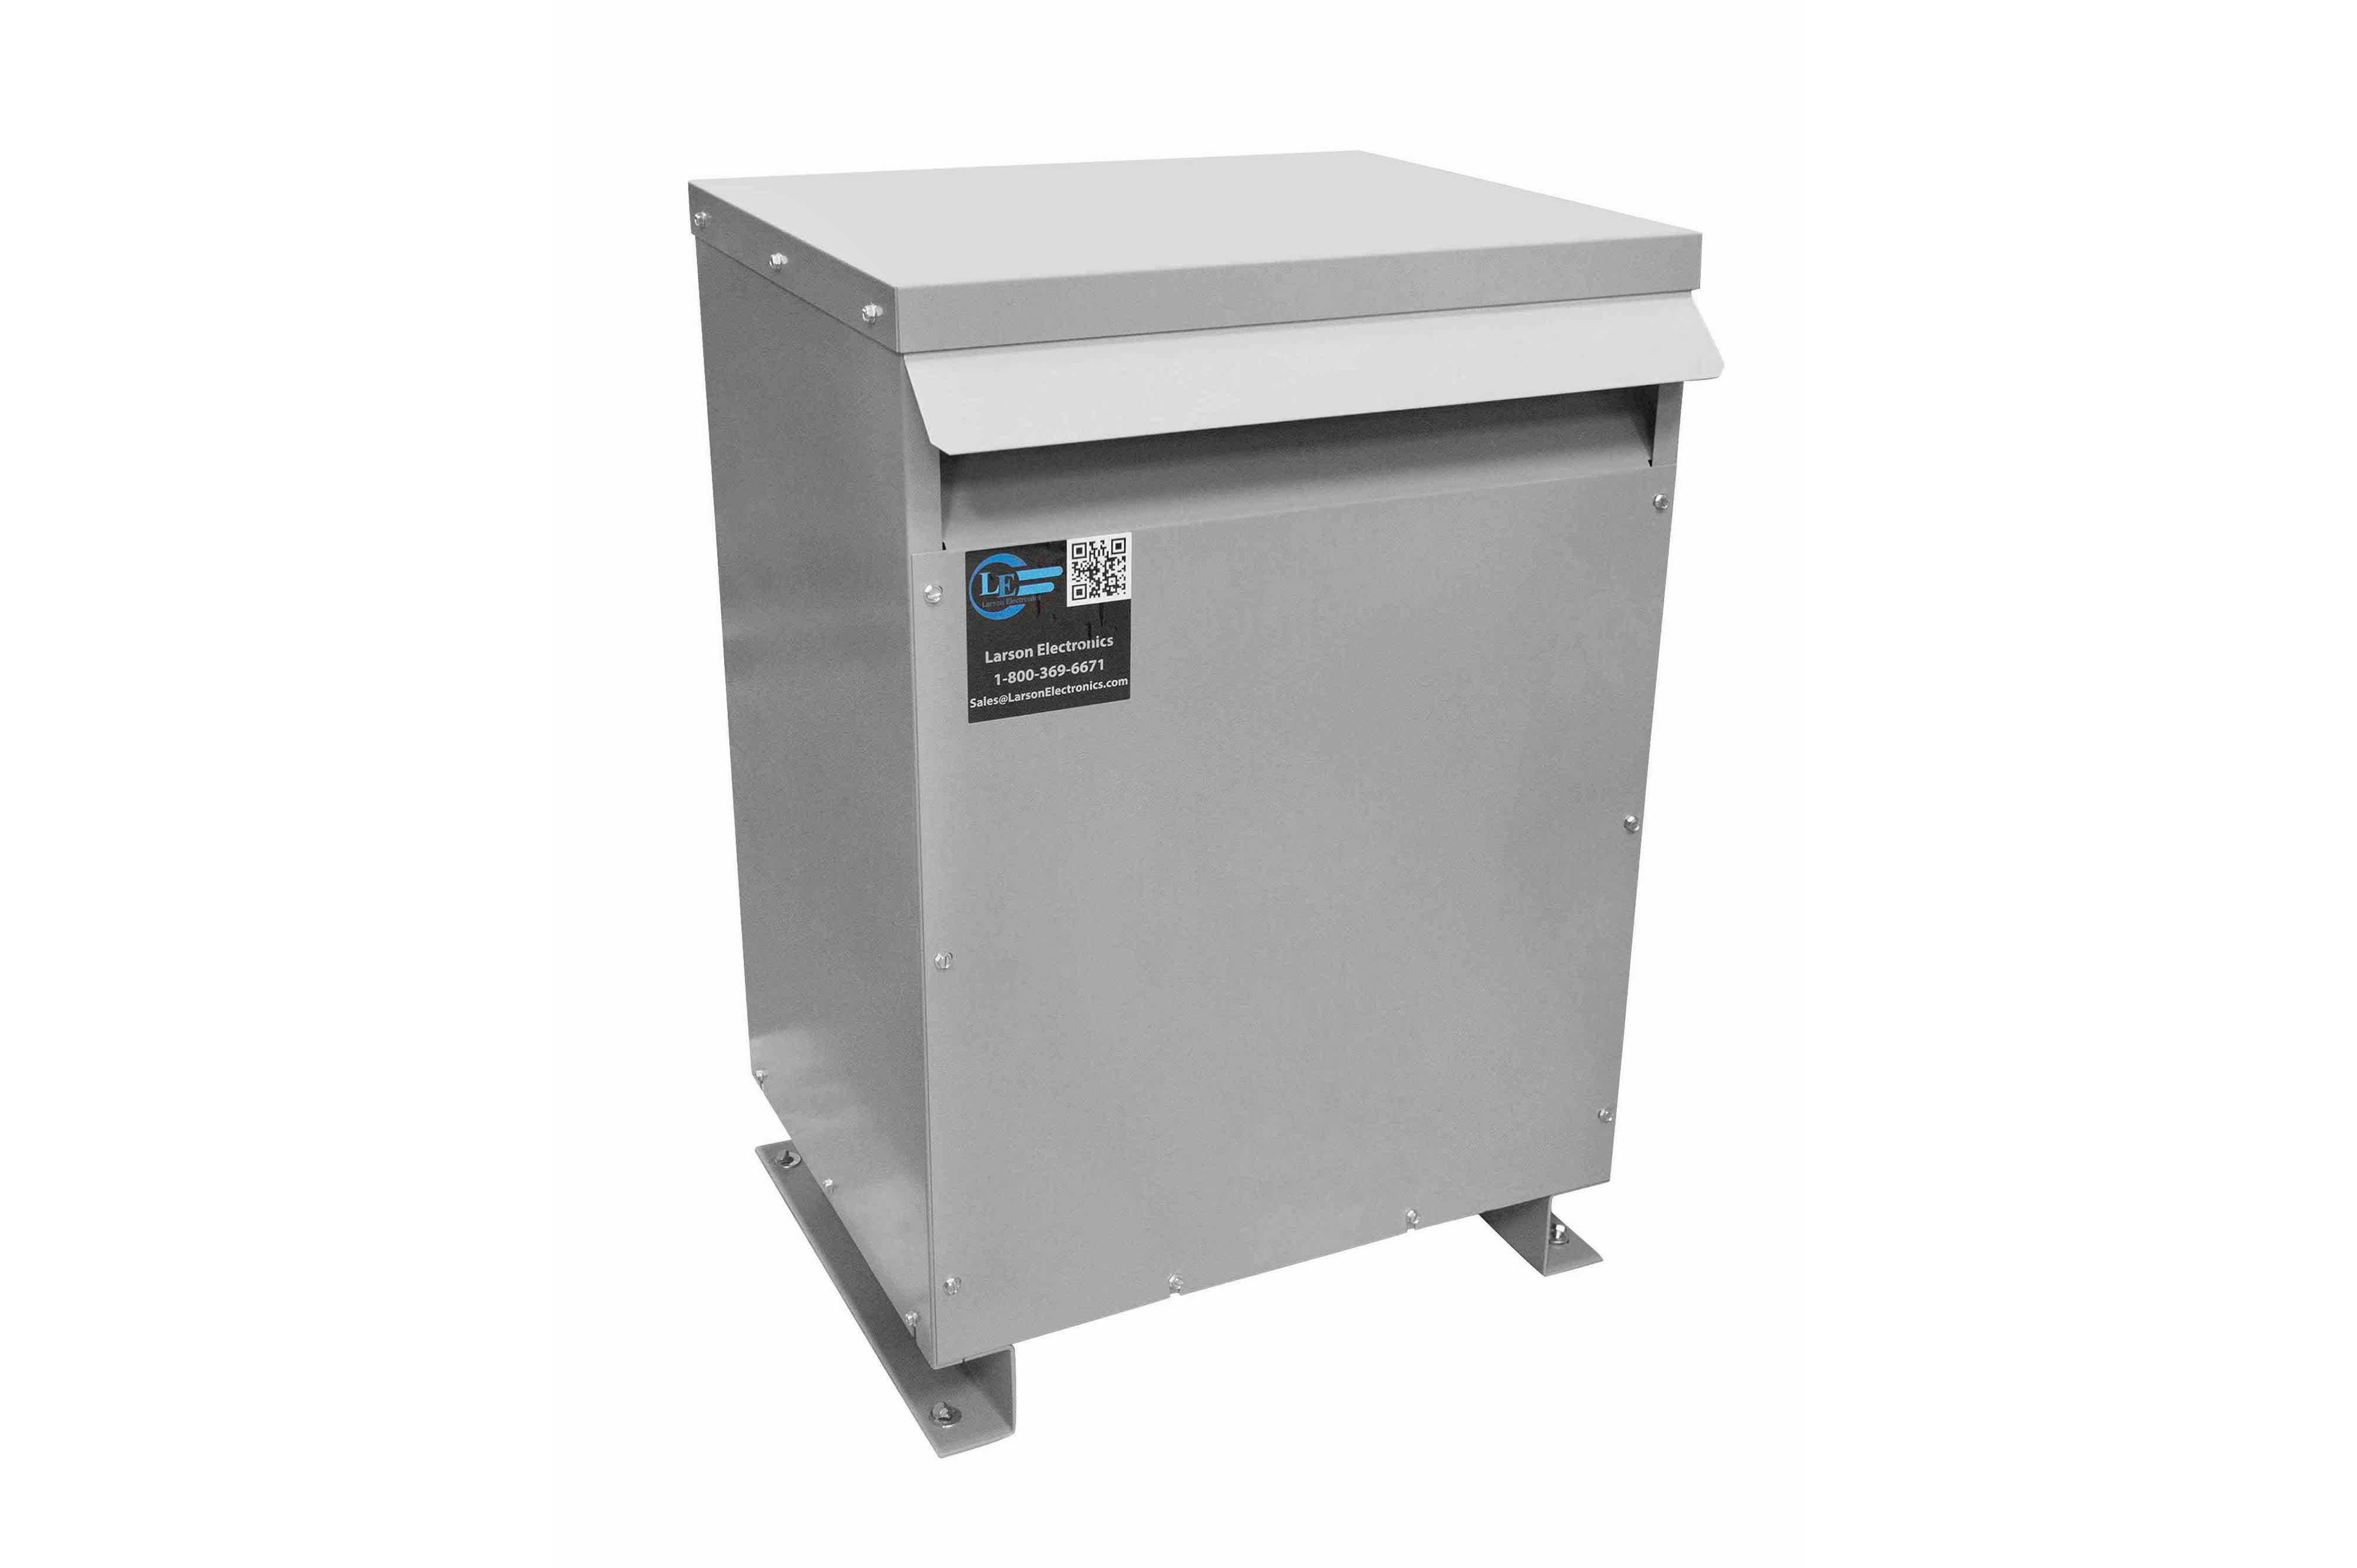 1000 kVA 3PH DOE Transformer, 380V Delta Primary, 600Y/347 Wye-N Secondary, N3R, Ventilated, 60 Hz